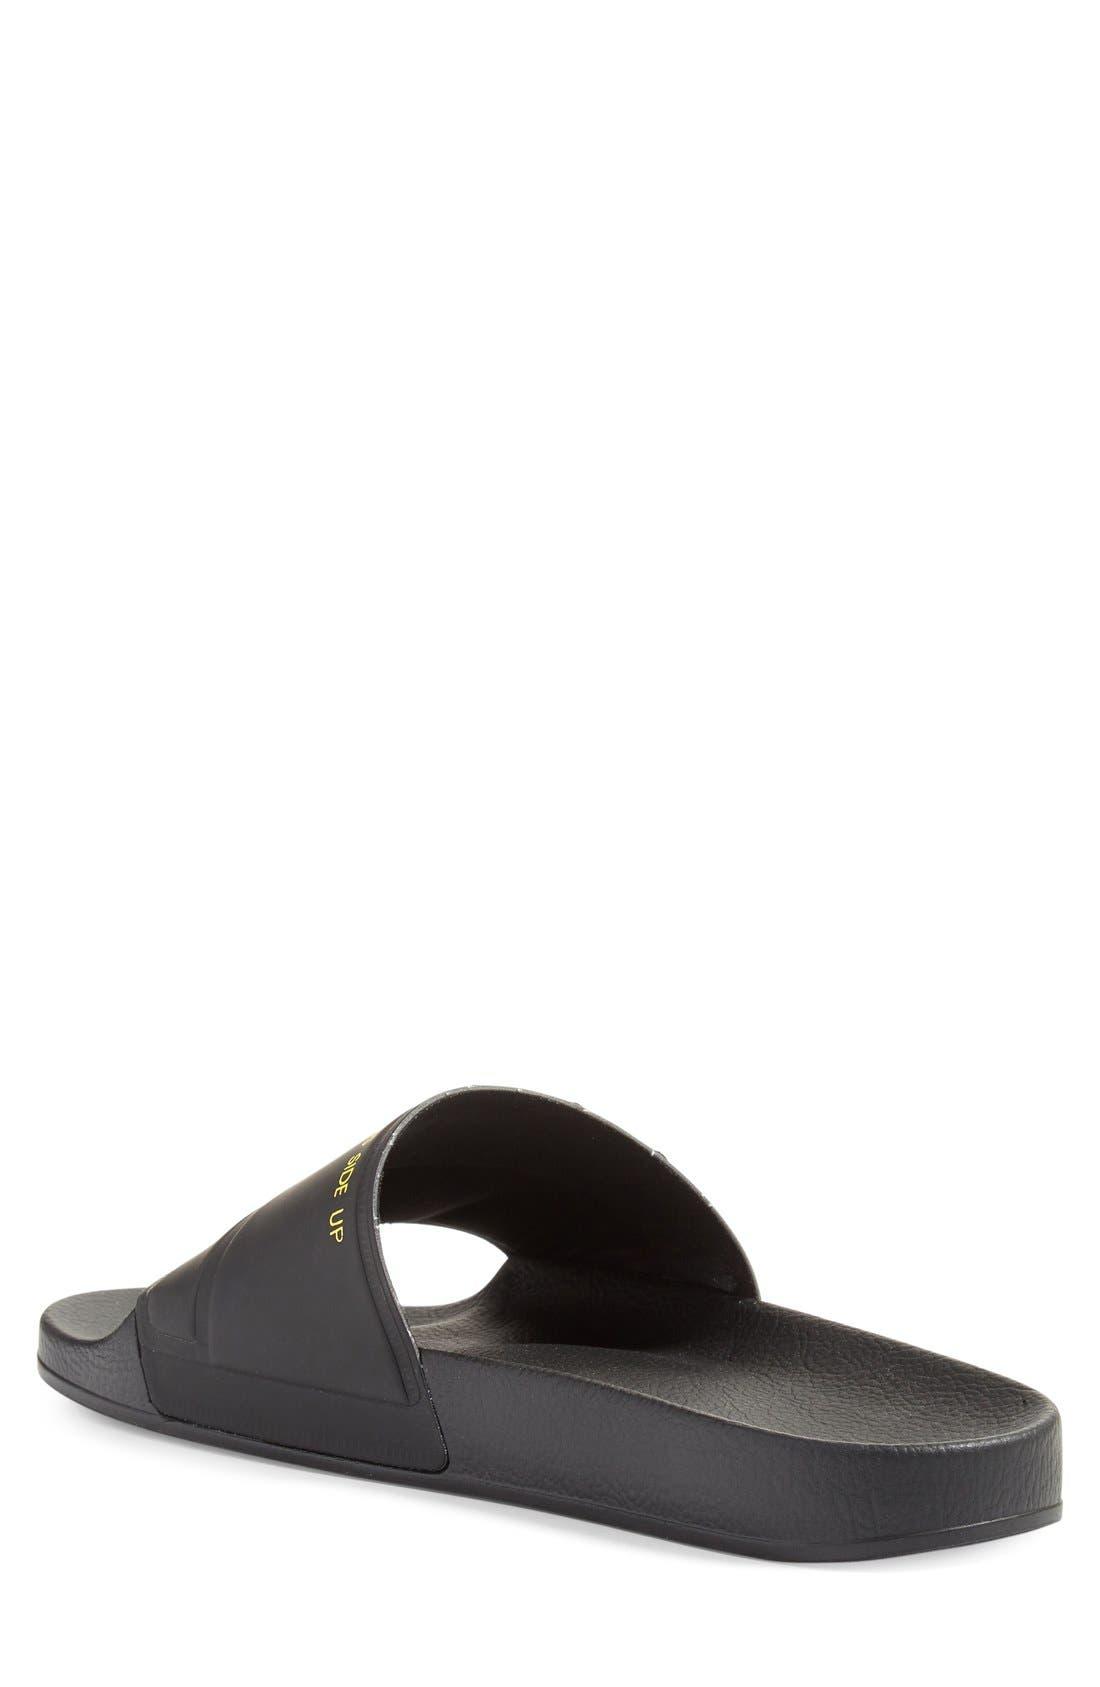 adidas by Raf Simons Bunny Adilette Slide Sandal,                             Alternate thumbnail 4, color,                             001